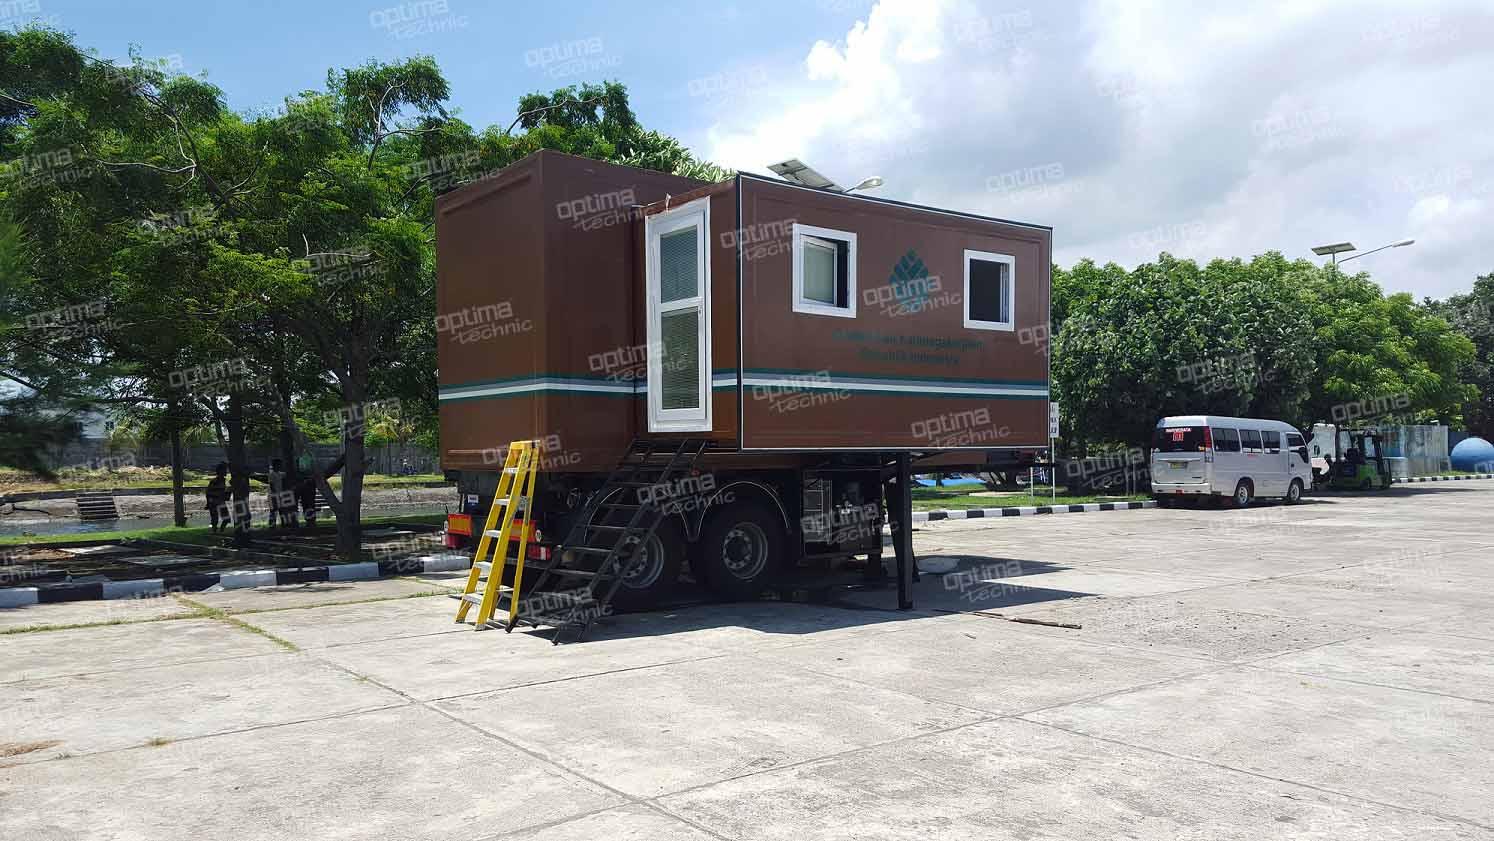 Mobile Training Unit